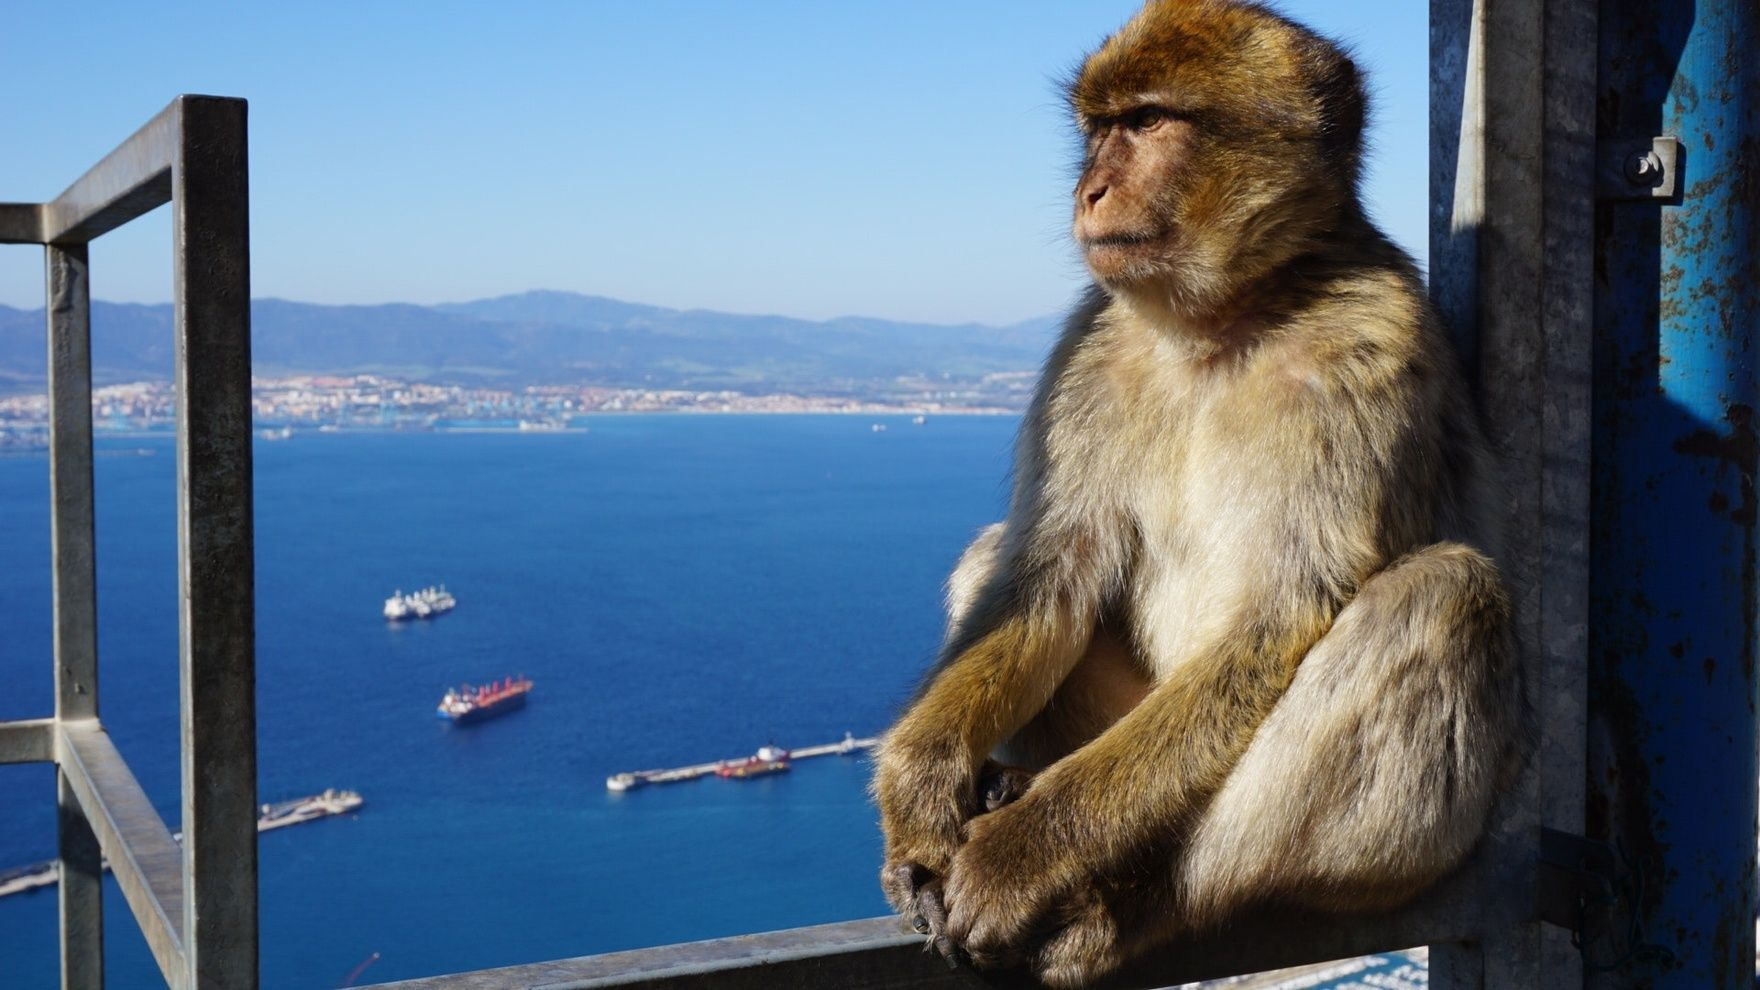 Mile building: Gibraltar— Tenerife